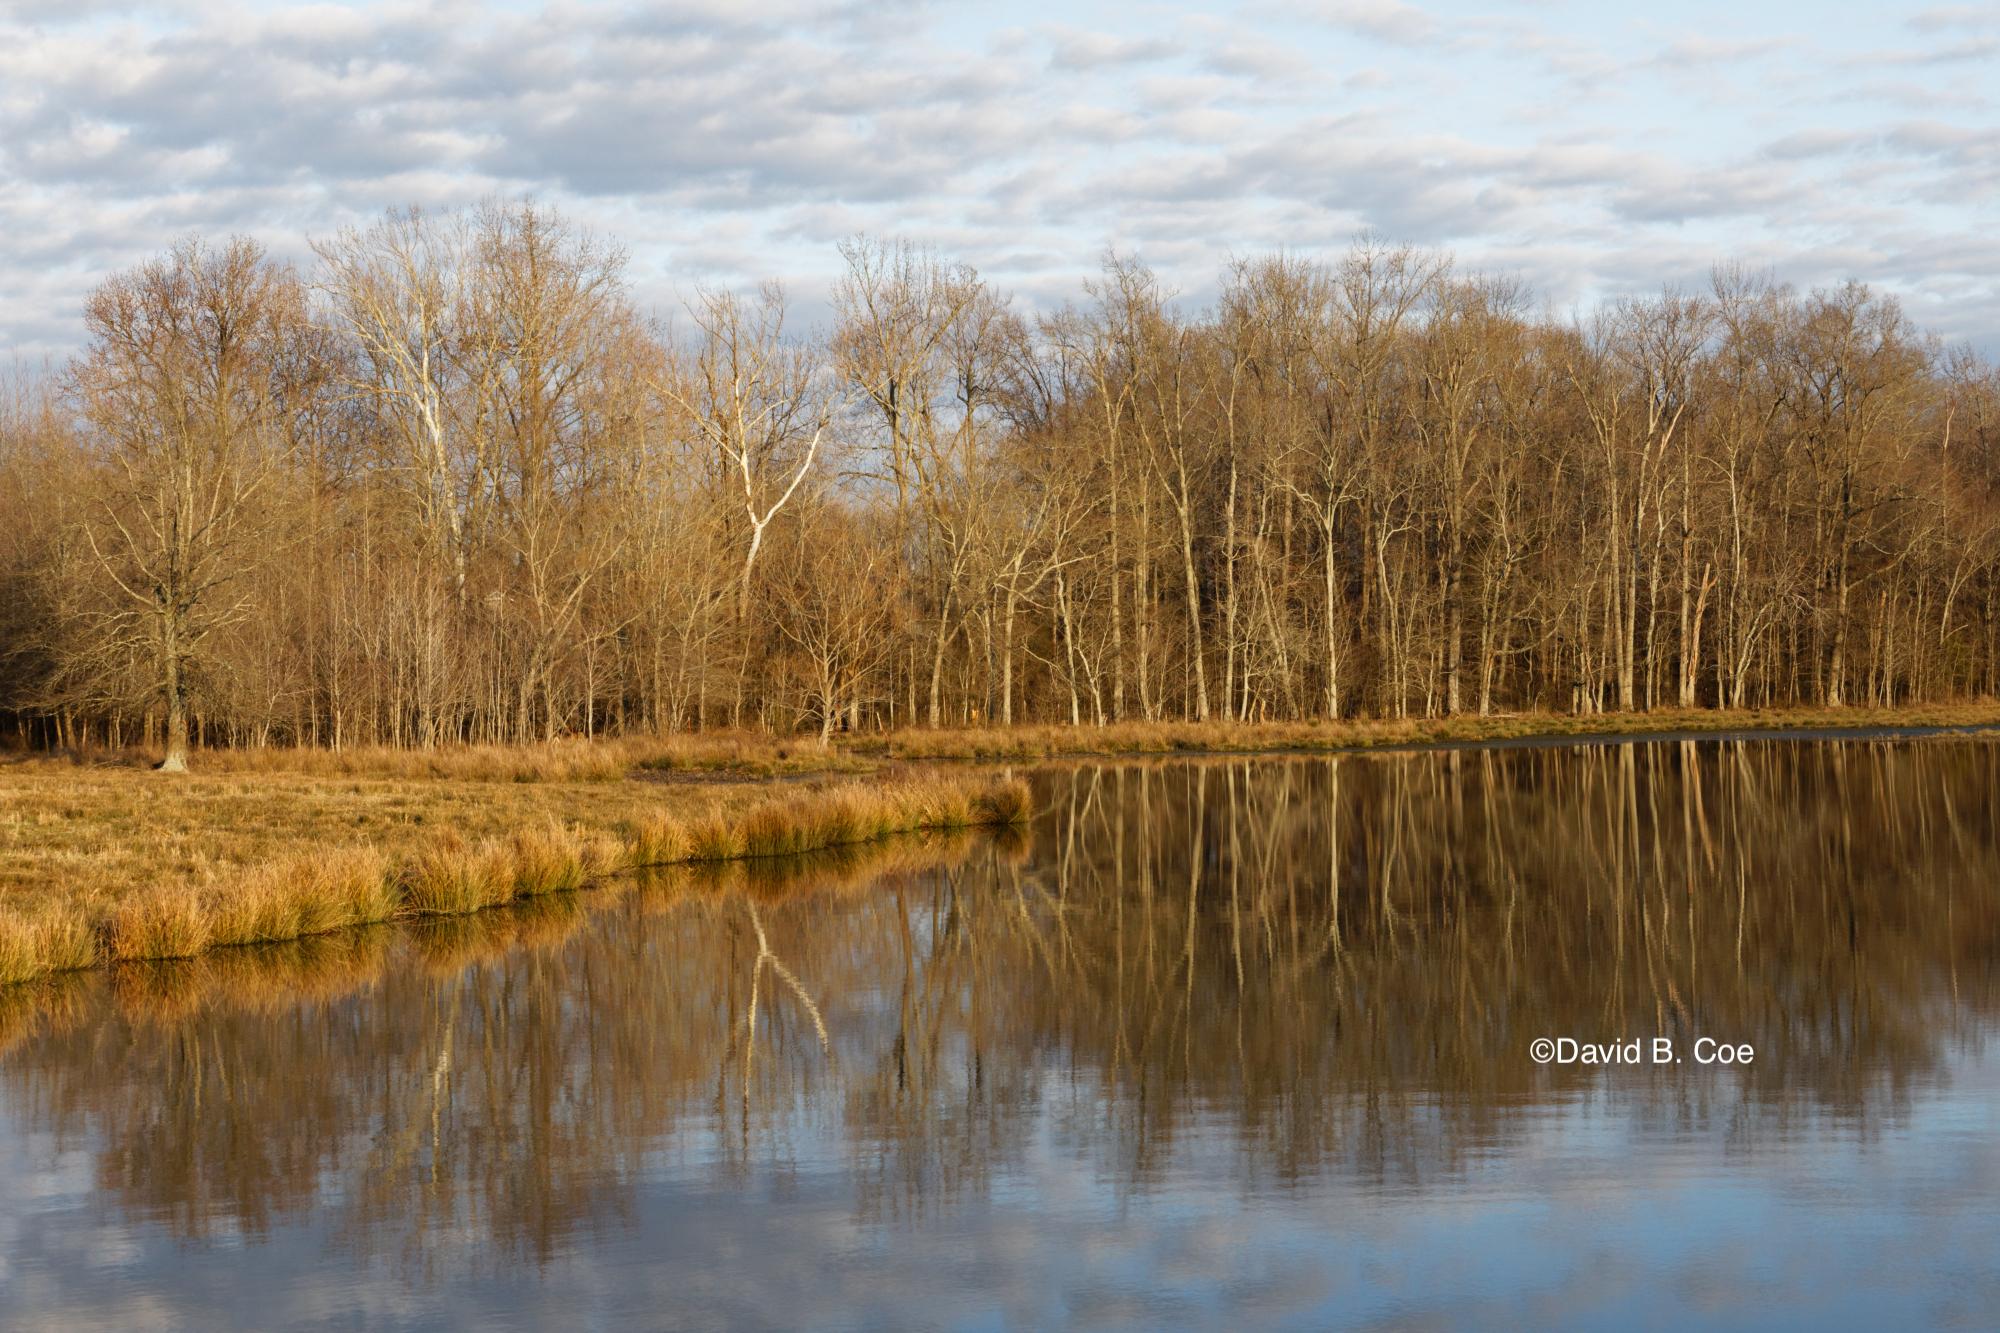 Farm Pond Reflection, by David B. Coe